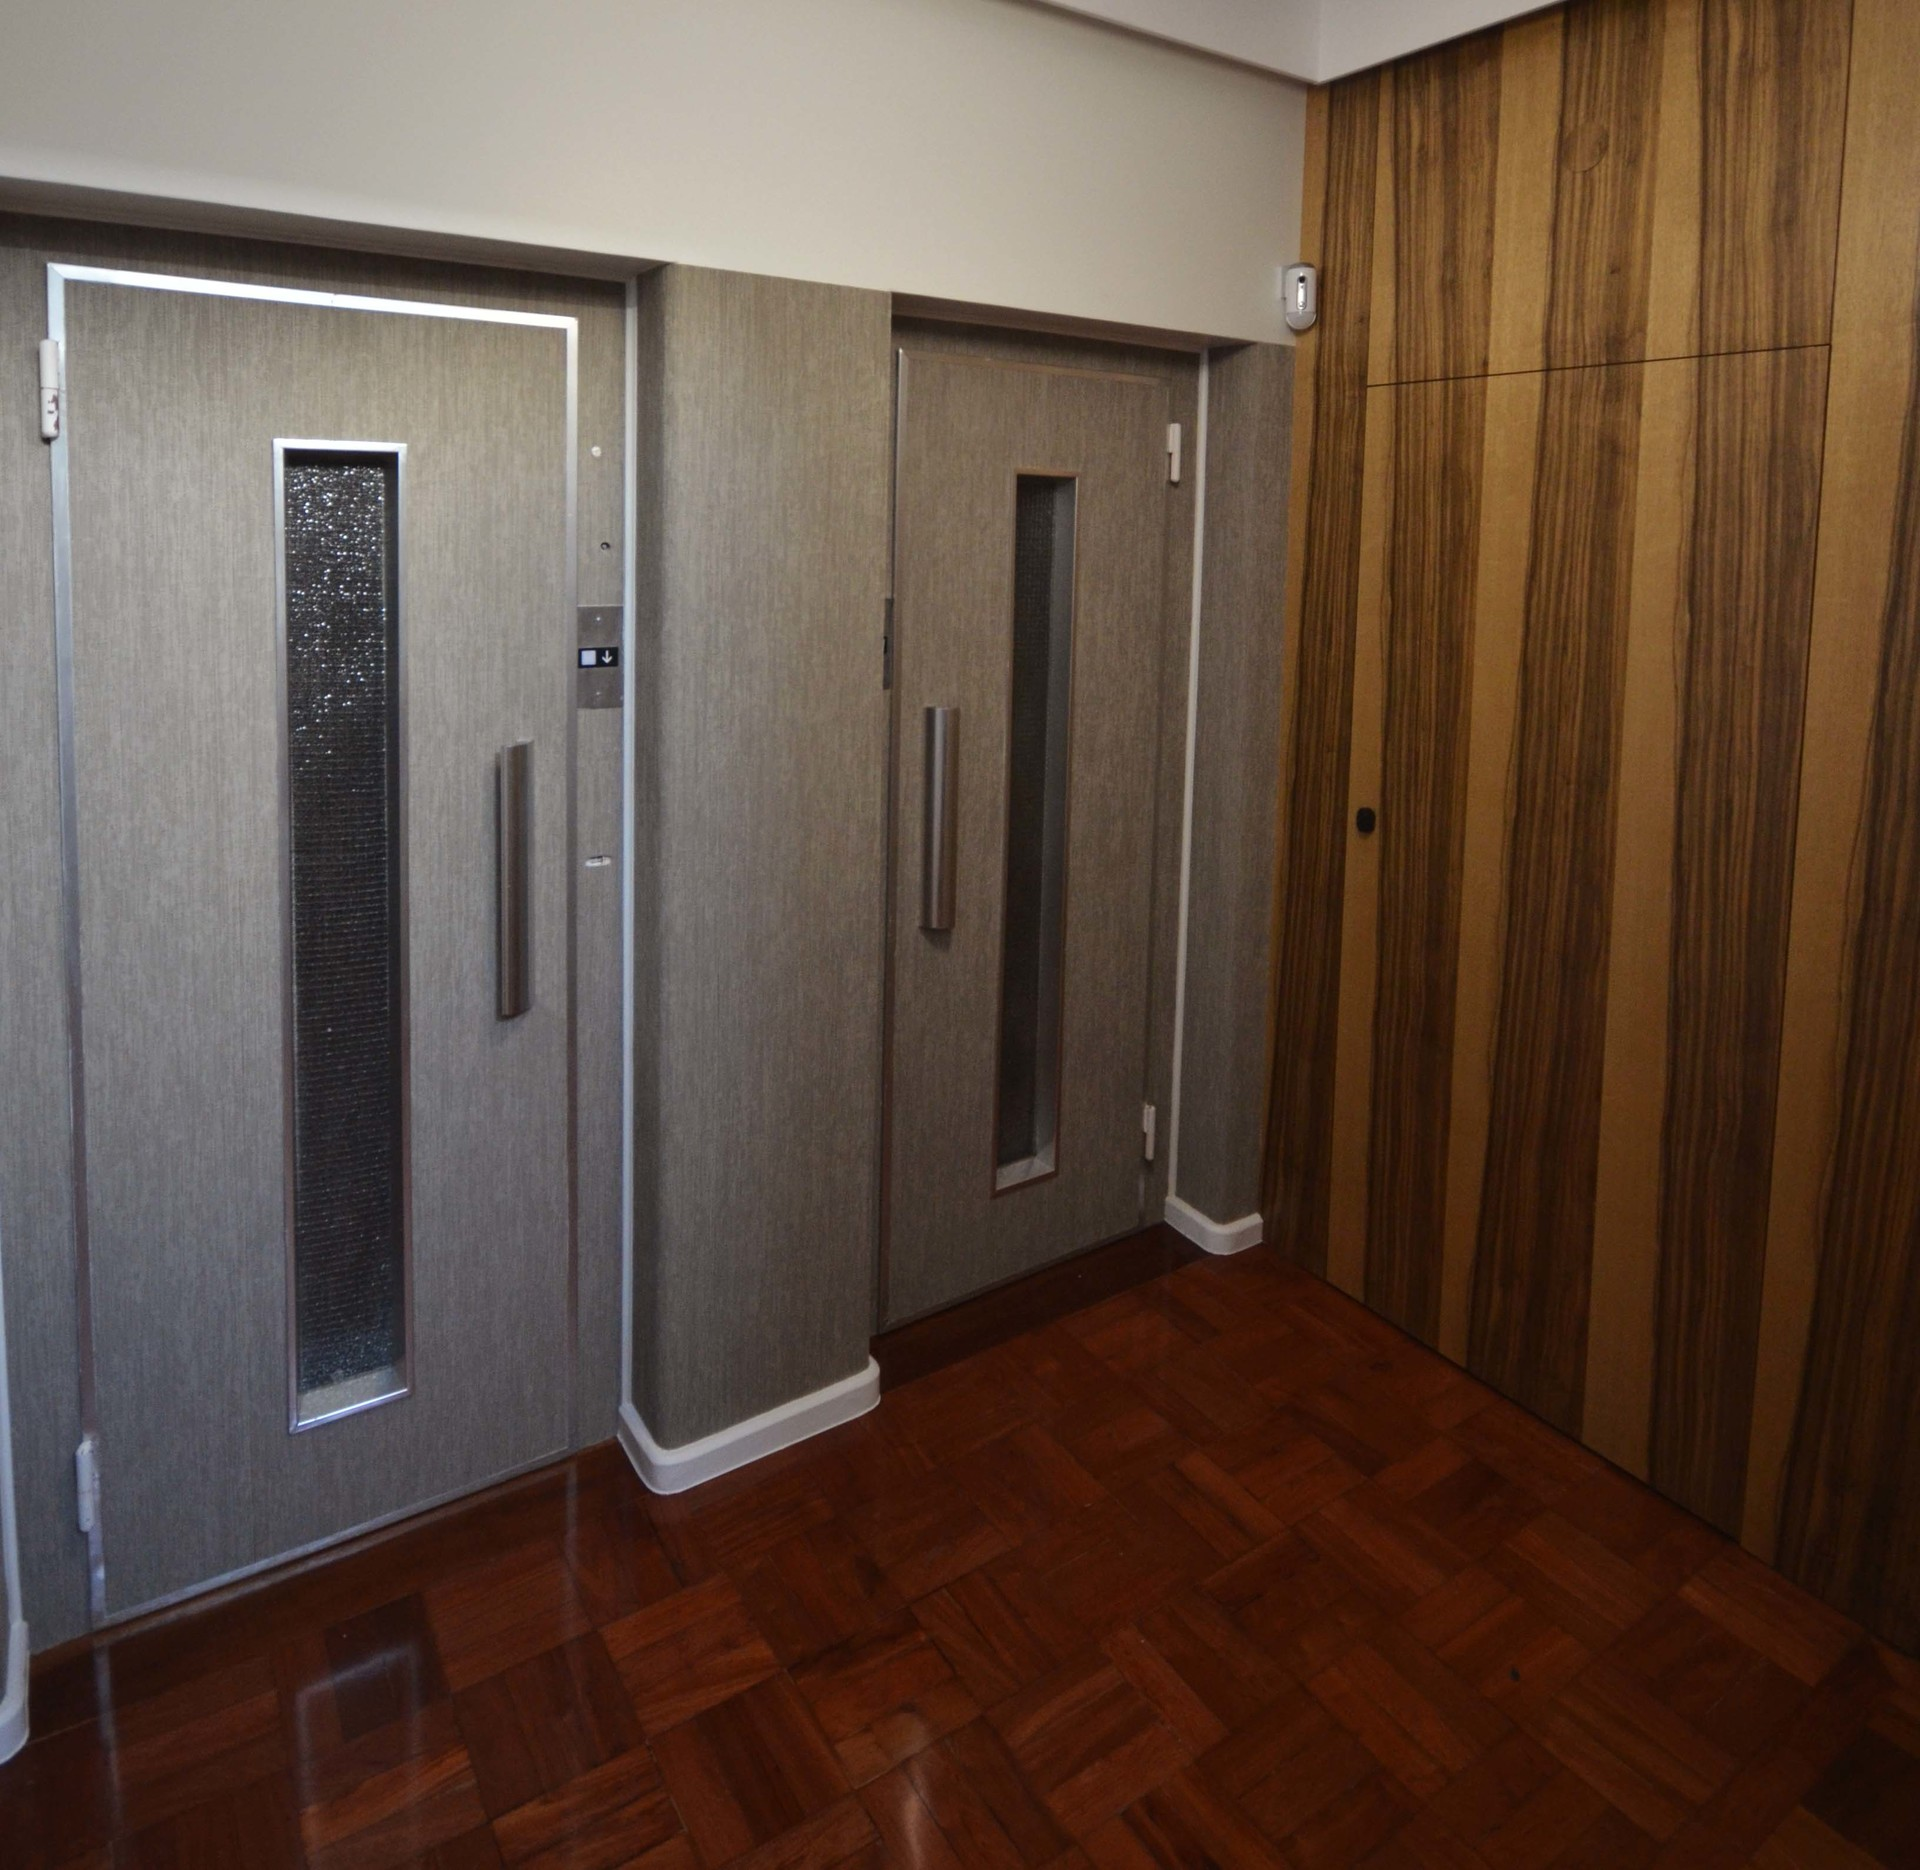 elevadores projetos arquitetura mjarc